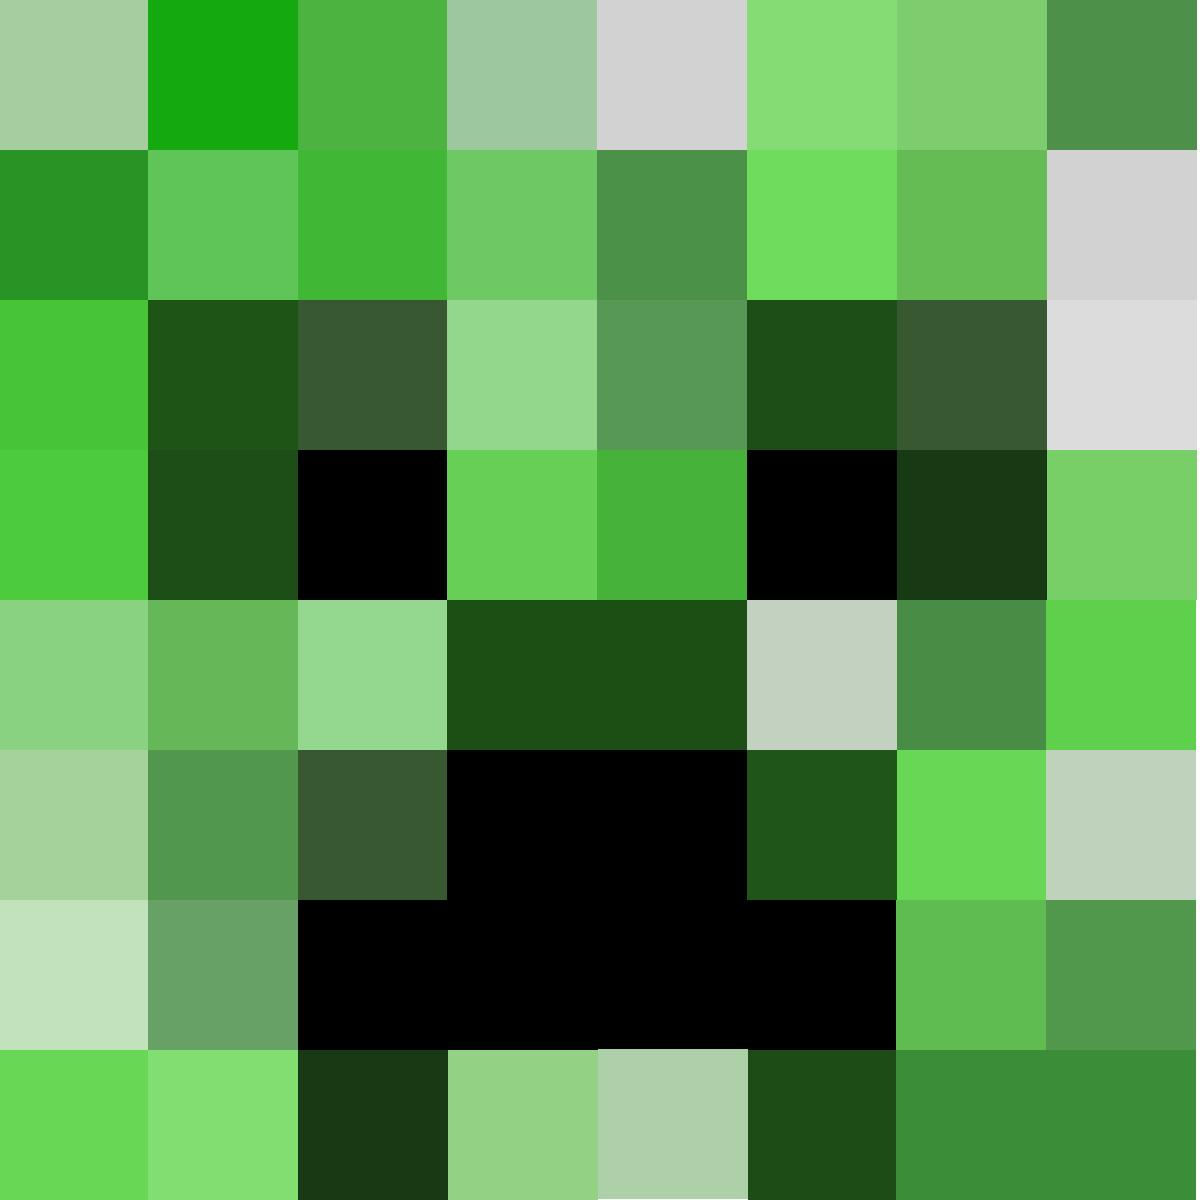 50 Minecraft Wallpapers Creeper Head On Wallpapersafari